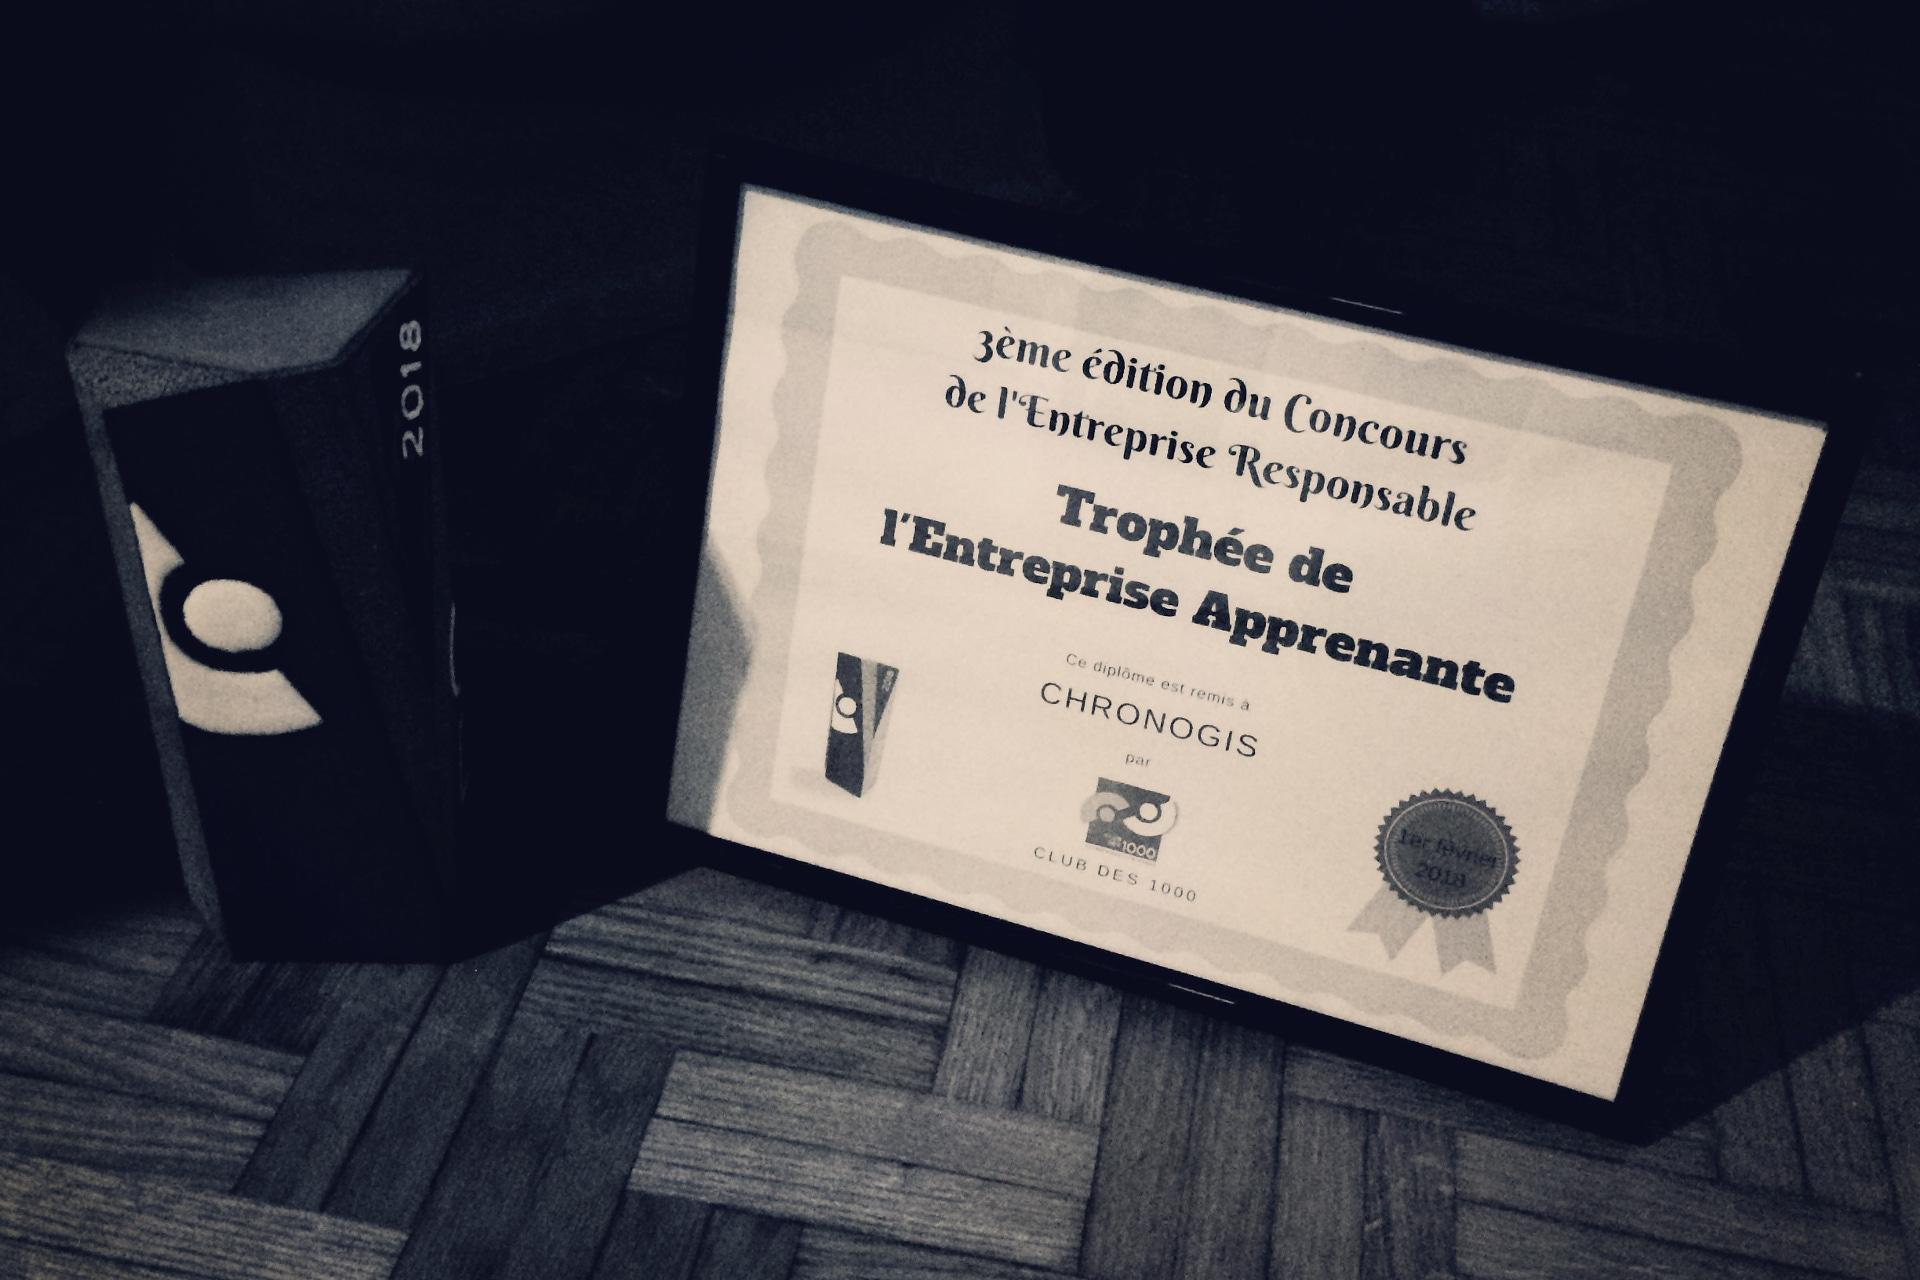 ChronoGIS, Entreprise Apprenante 2018